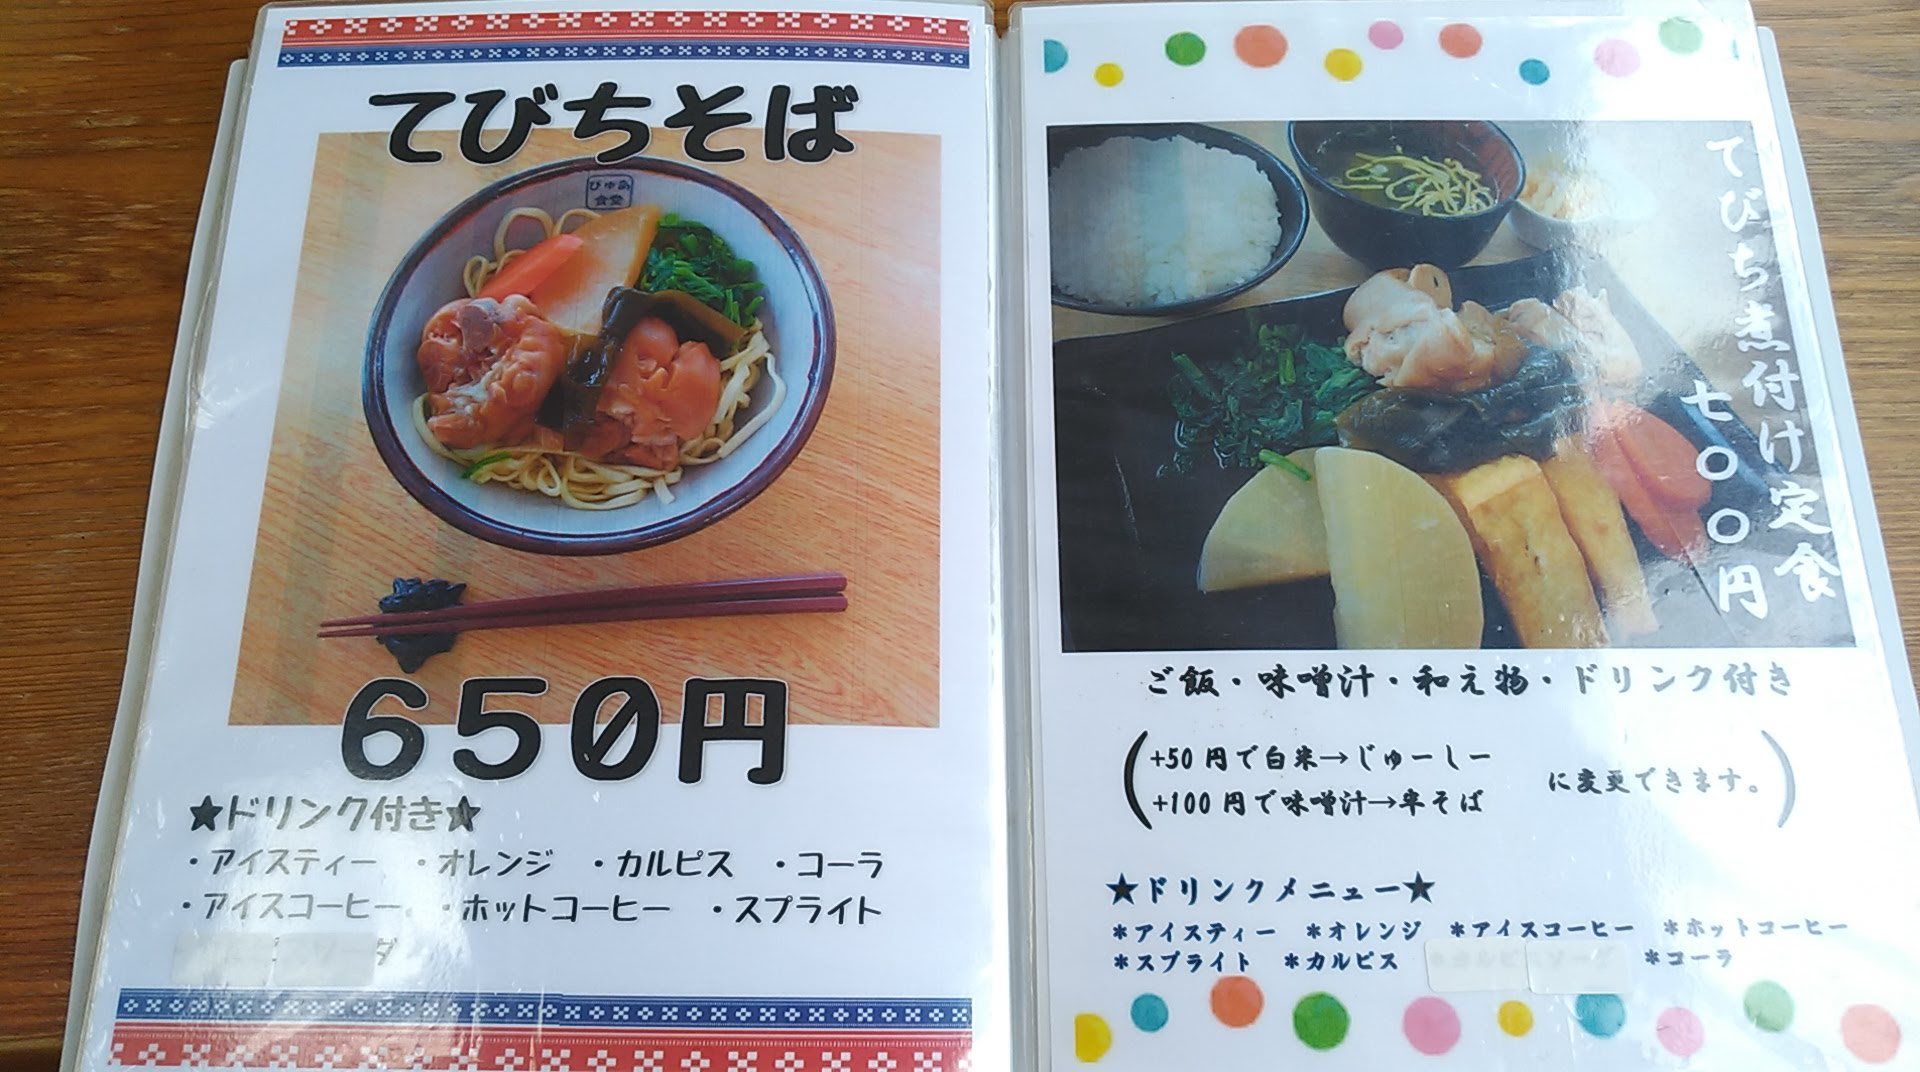 the menu of Pure shokudou 9